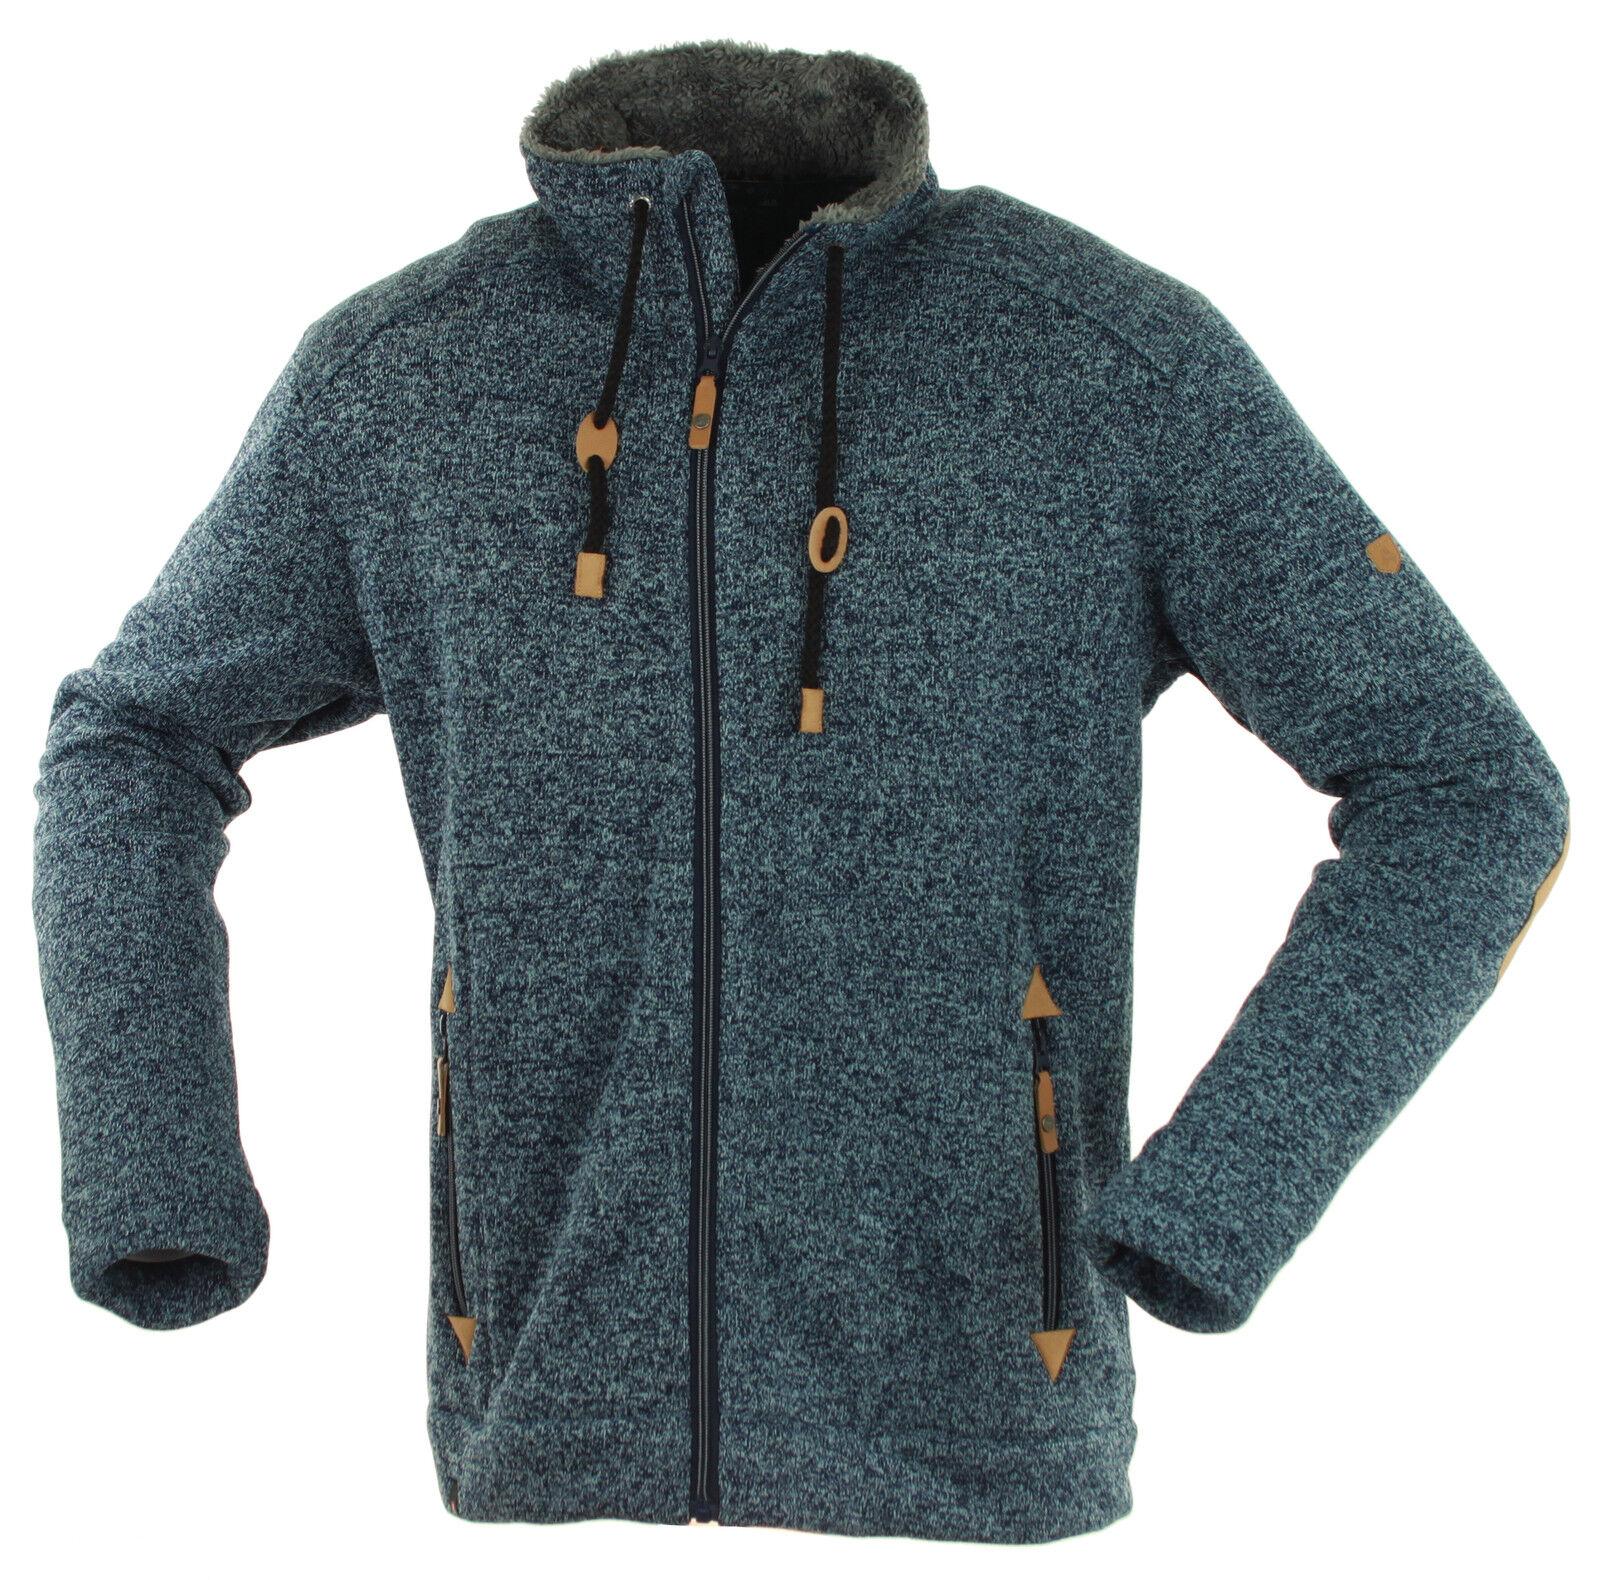 Maul Lichtenau Herren Polar-Strickfleece-Jacke Fleece super warm atmungsaktiv